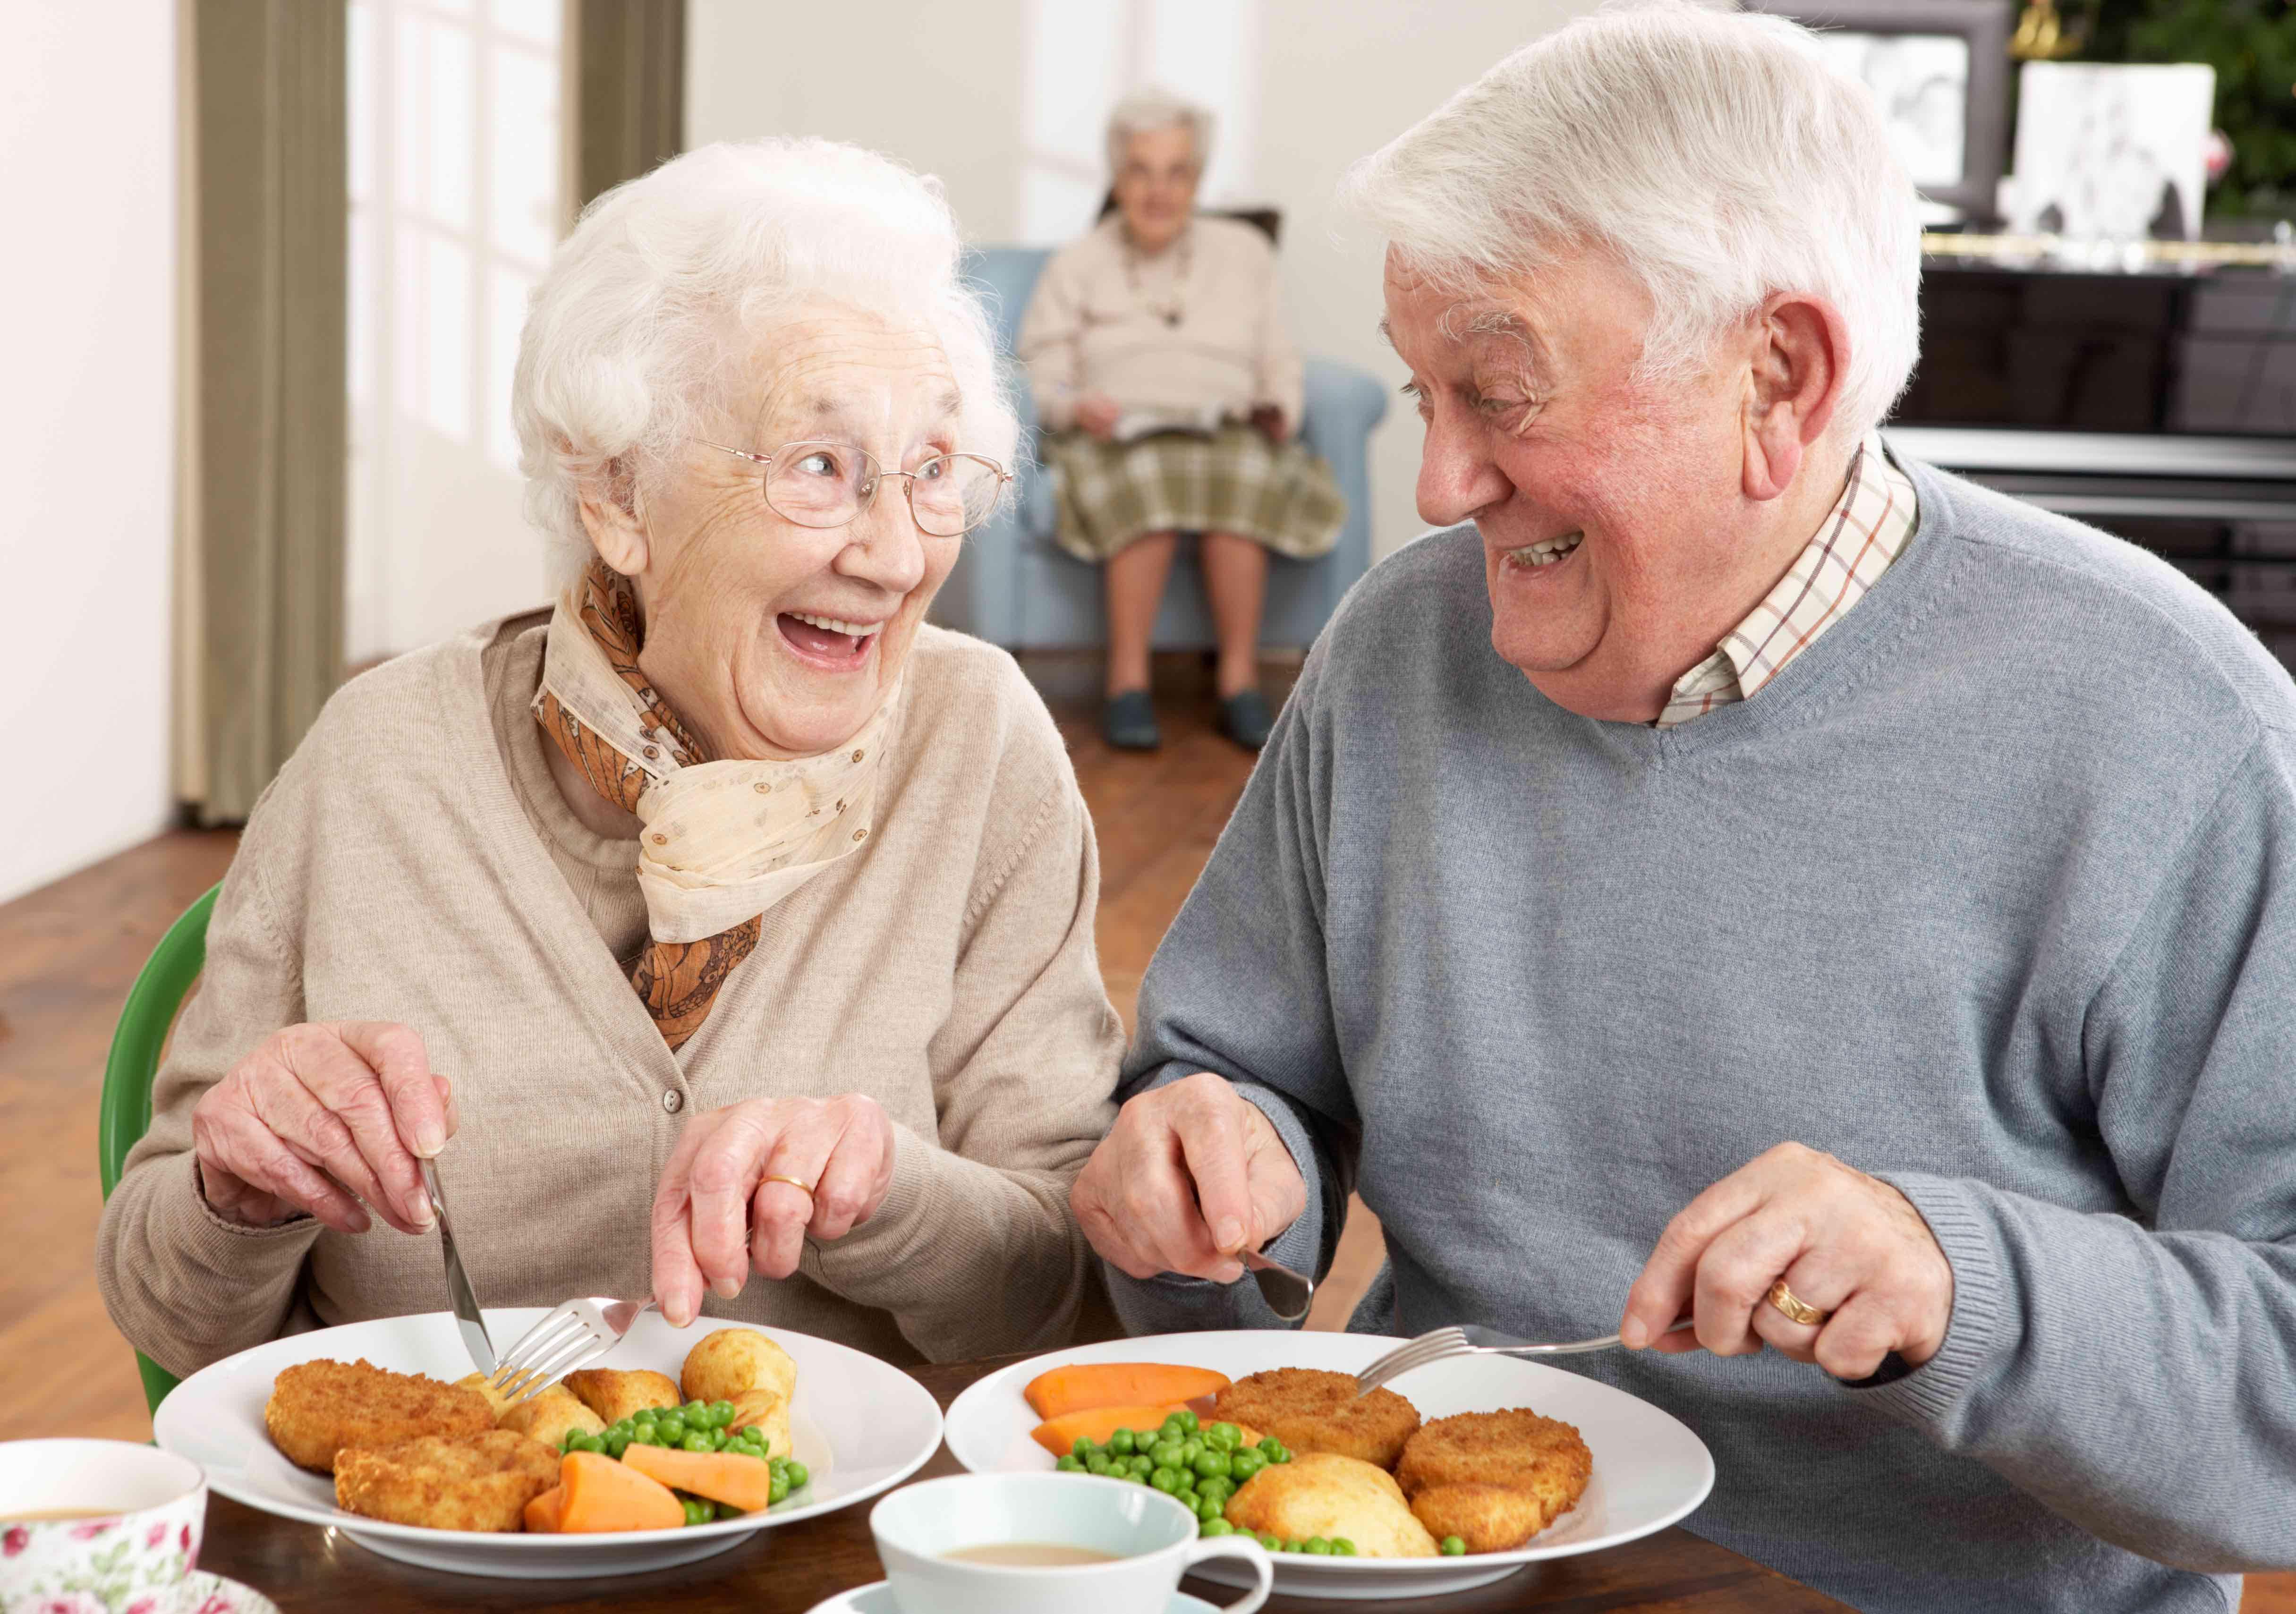 8 Tips When Touring an Austin Senior Community on a Senior's Behalf